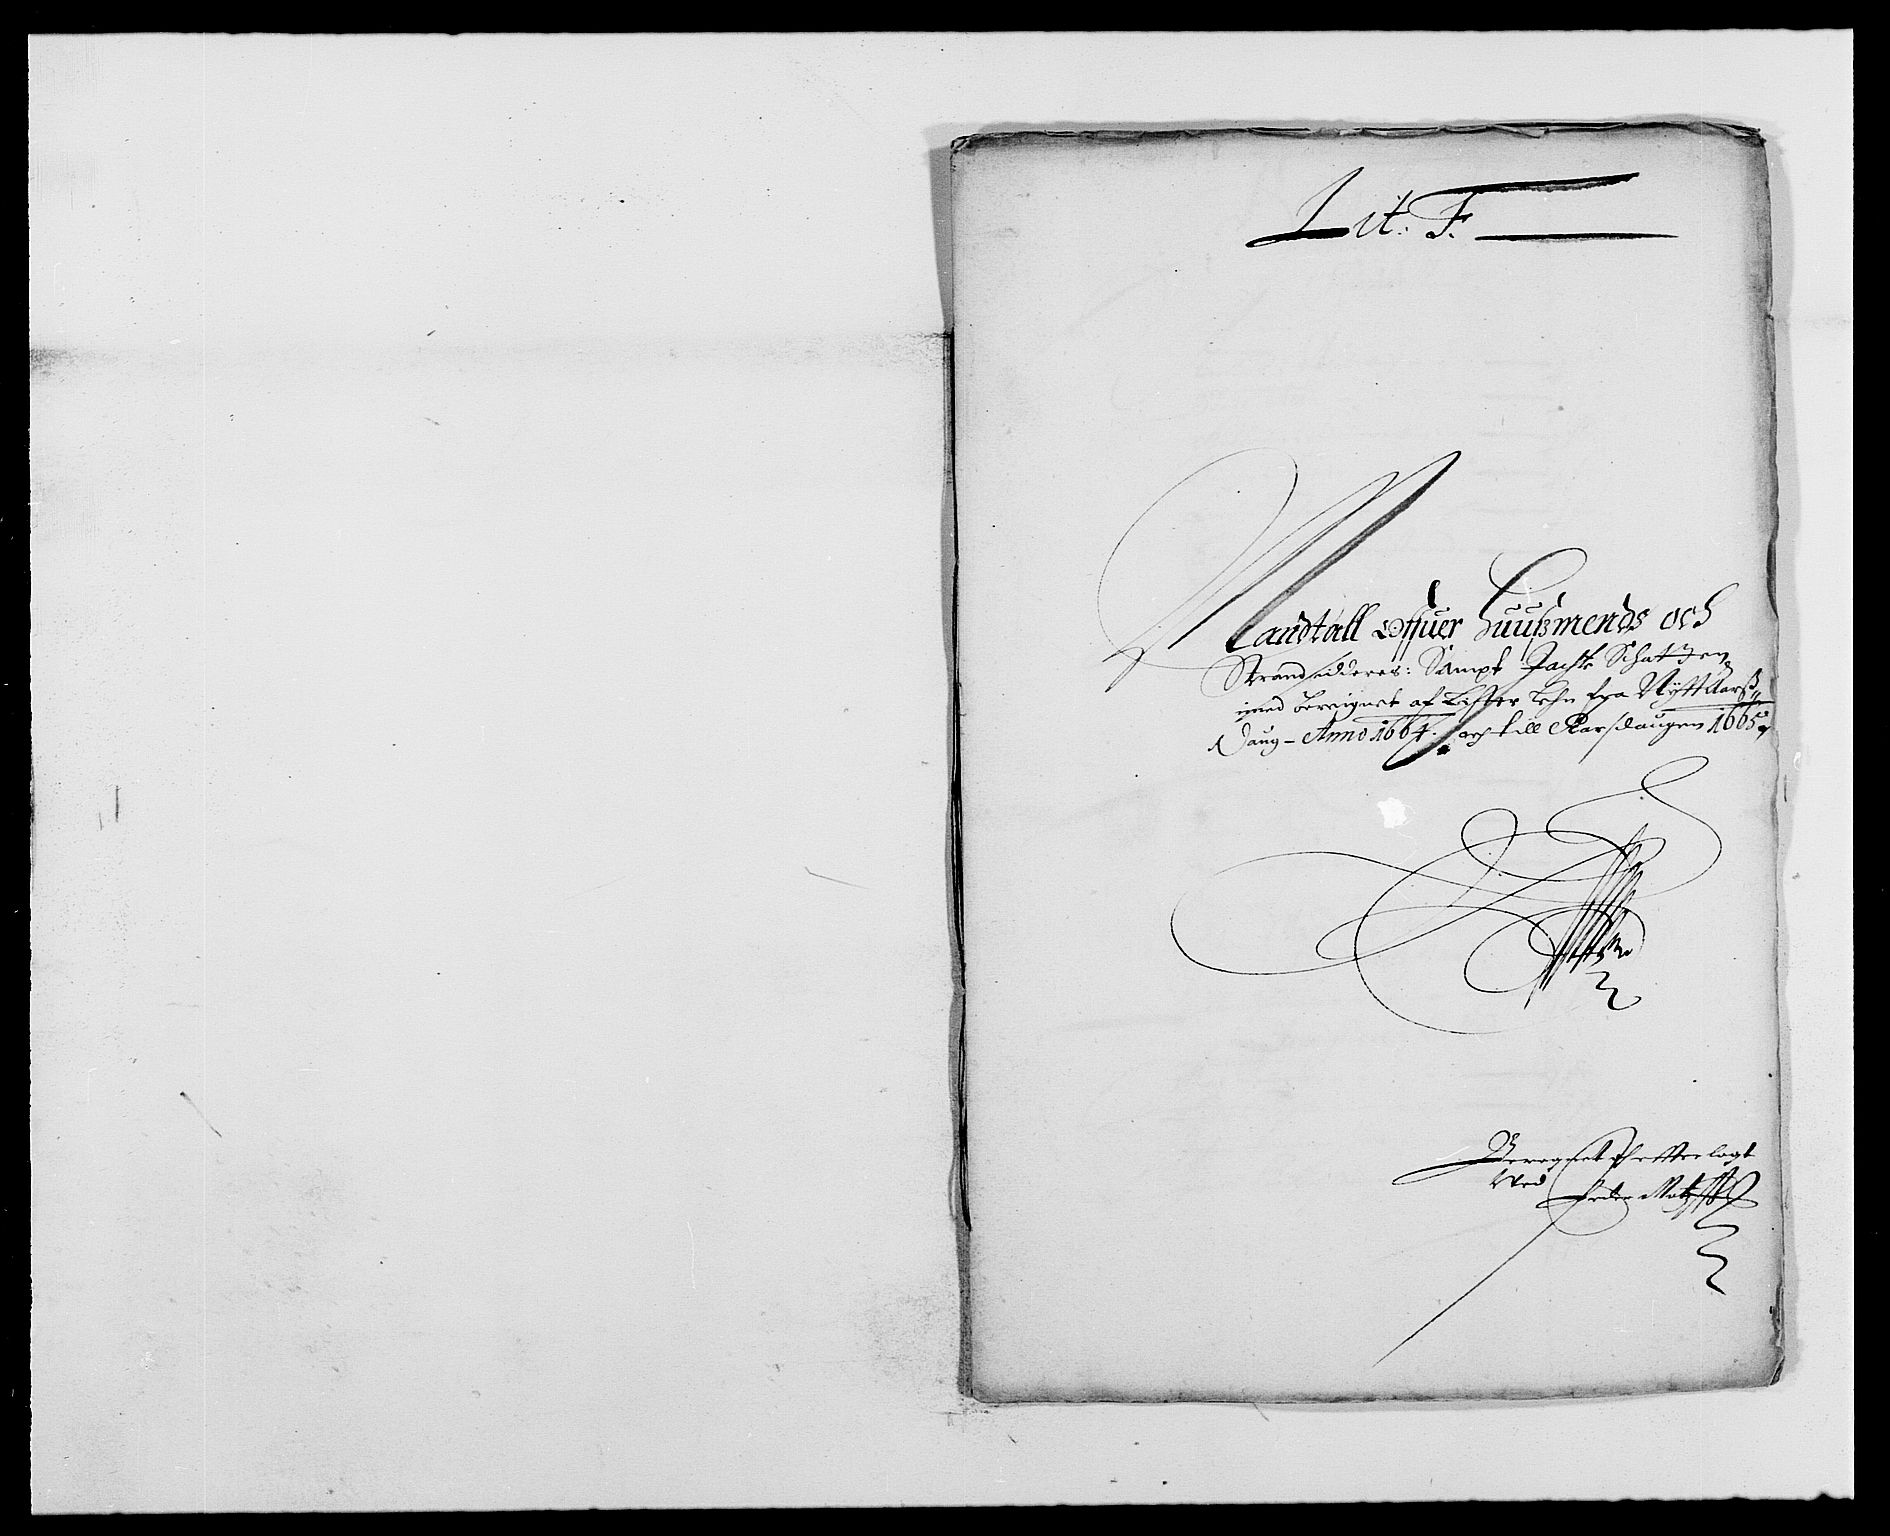 RA, Rentekammeret inntil 1814, Reviderte regnskaper, Fogderegnskap, R41/L2523: Fogderegnskap Lista, 1663-1664, s. 332